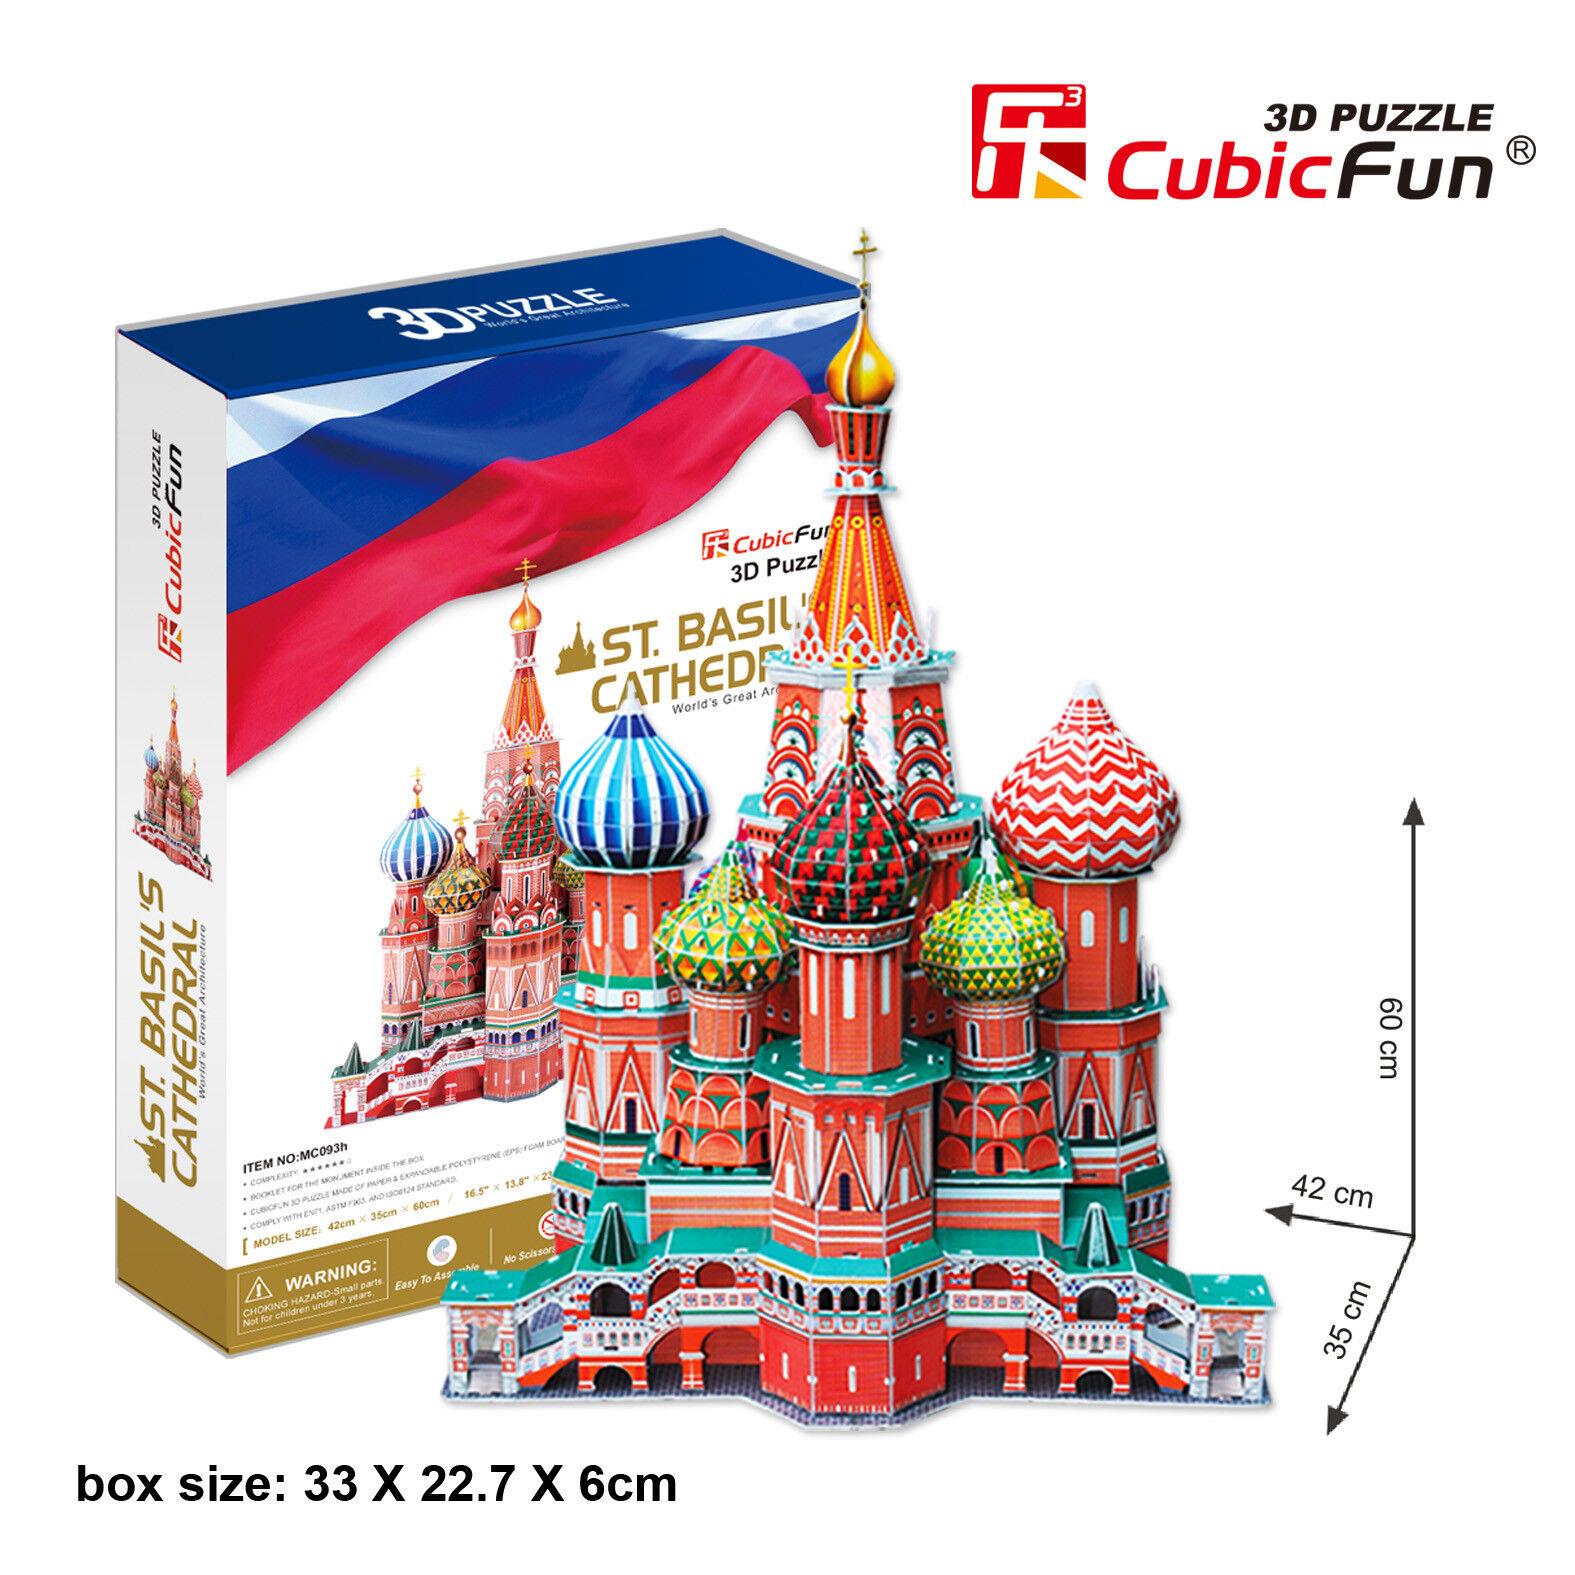 CubicFun 3D Puzzle ST. Basil's Cathedral Russia MC093h173 pcs Handy Jigsaw